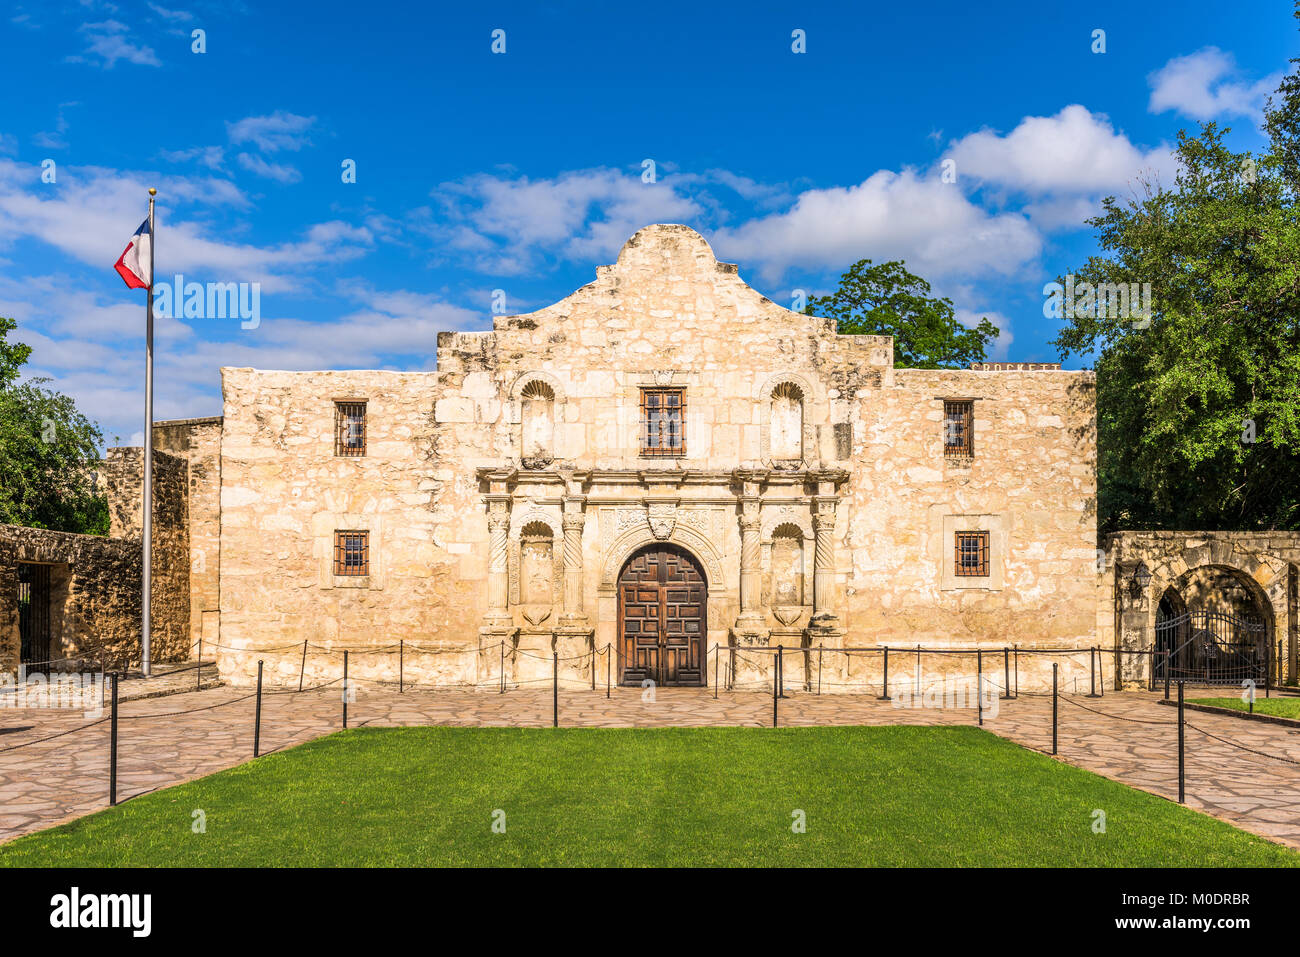 The Alamo in San Antonio, Texas, USA. - Stock Image